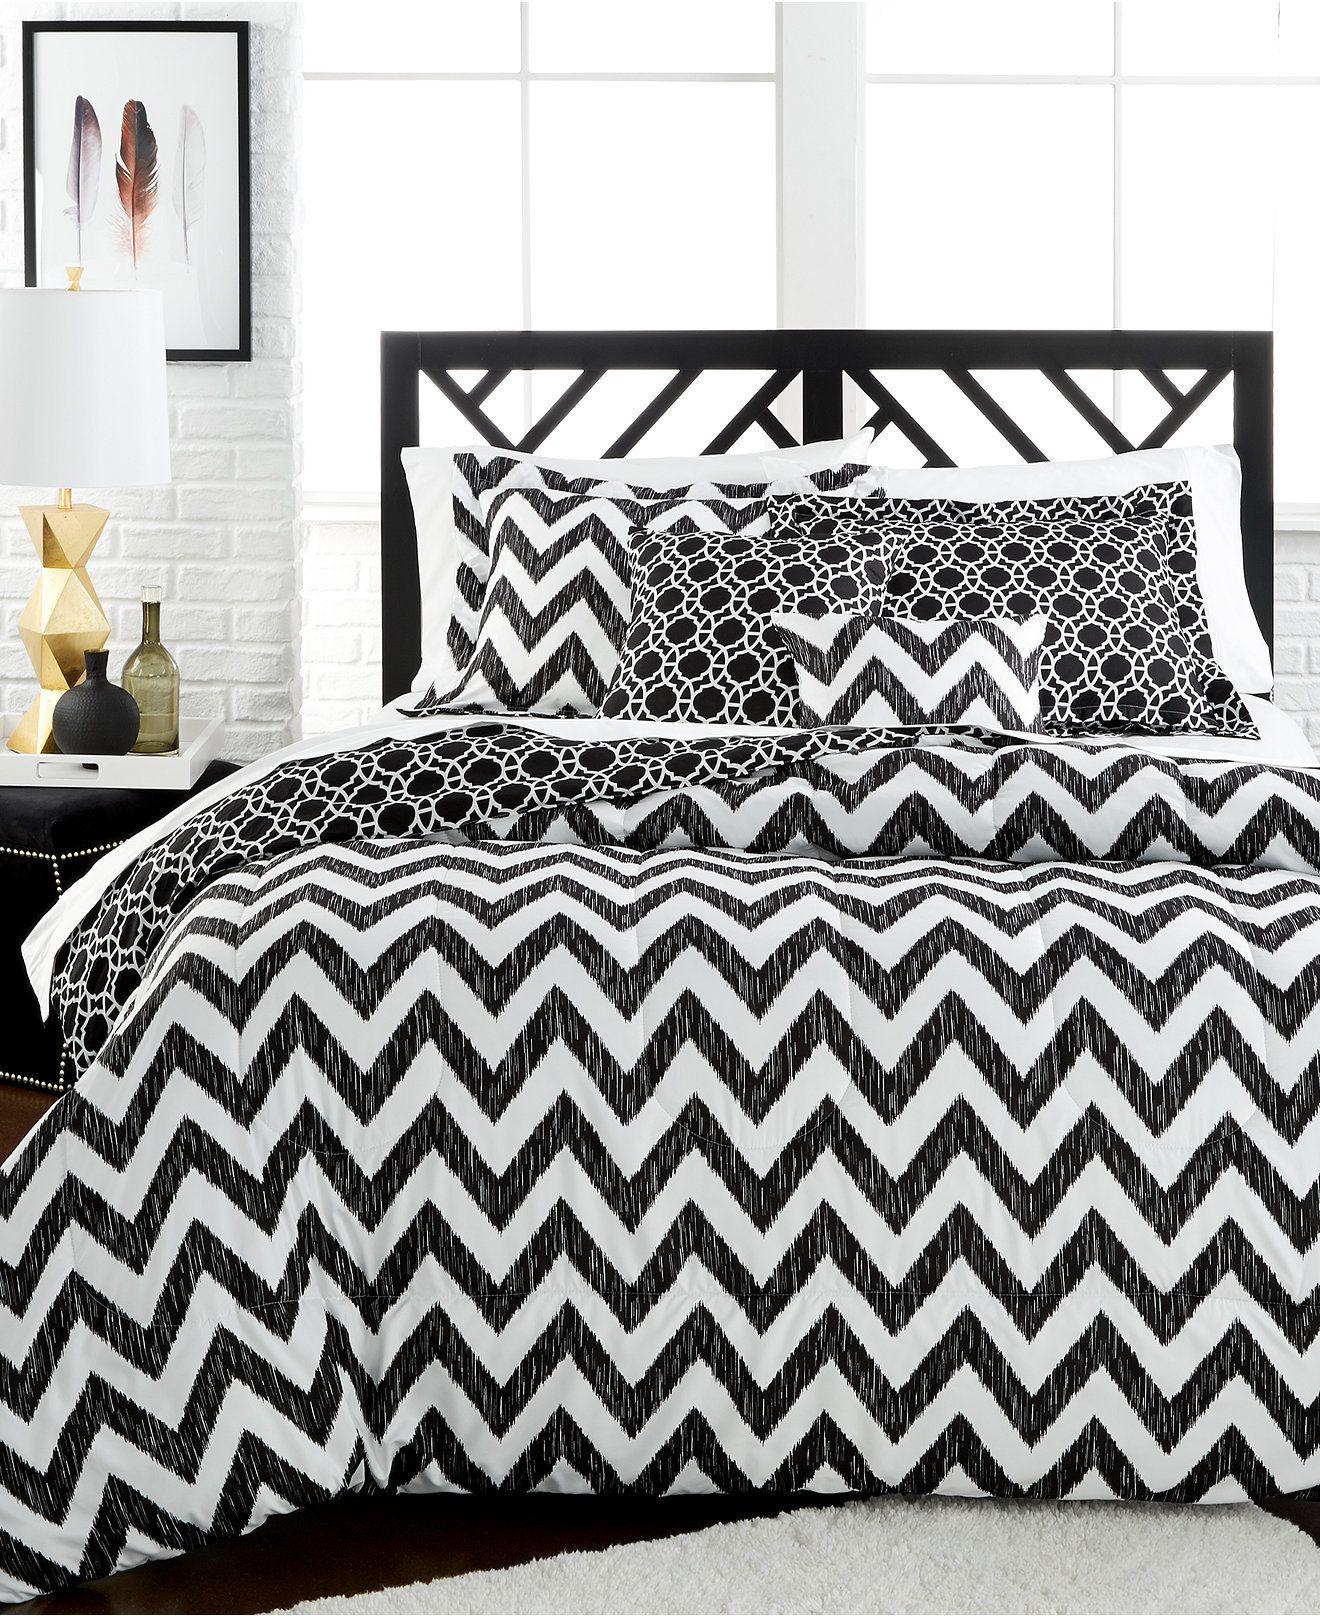 bed black quilt full bag comforter linens a in bedding chevron flowered set teen sets and white girls